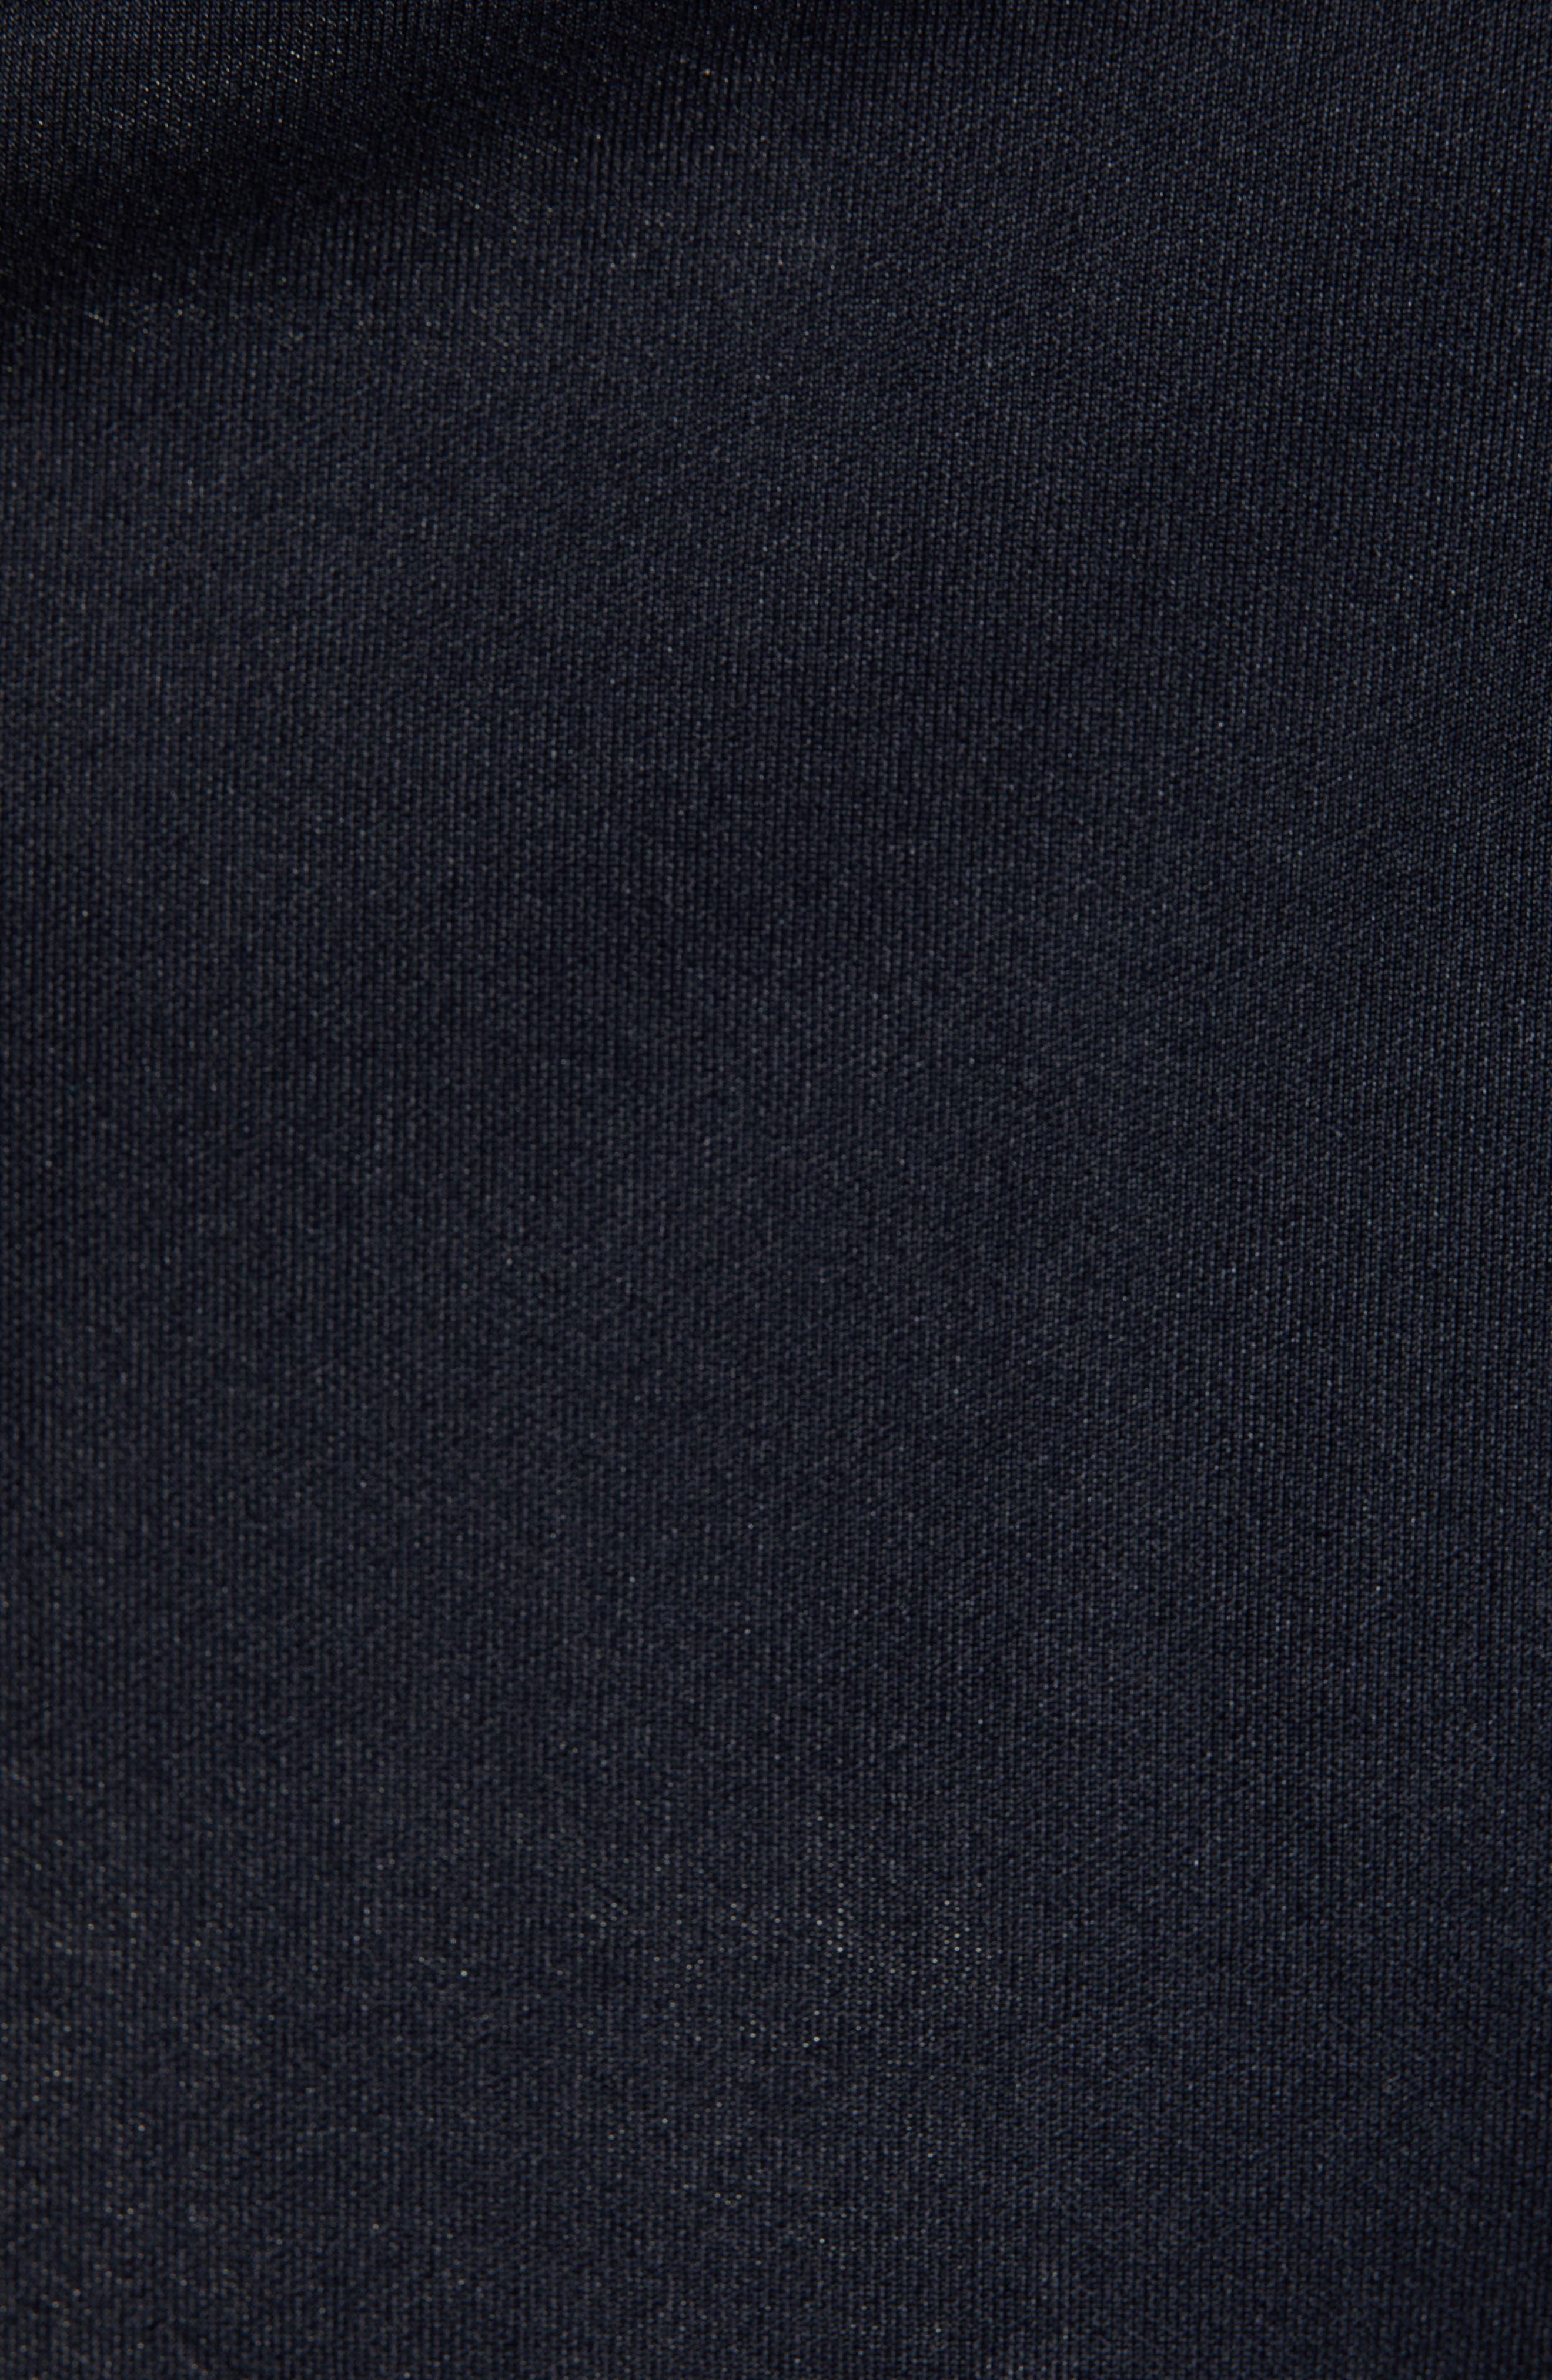 THE KOOPLES, Full Zip Sweatshirt, Alternate thumbnail 5, color, NAVY